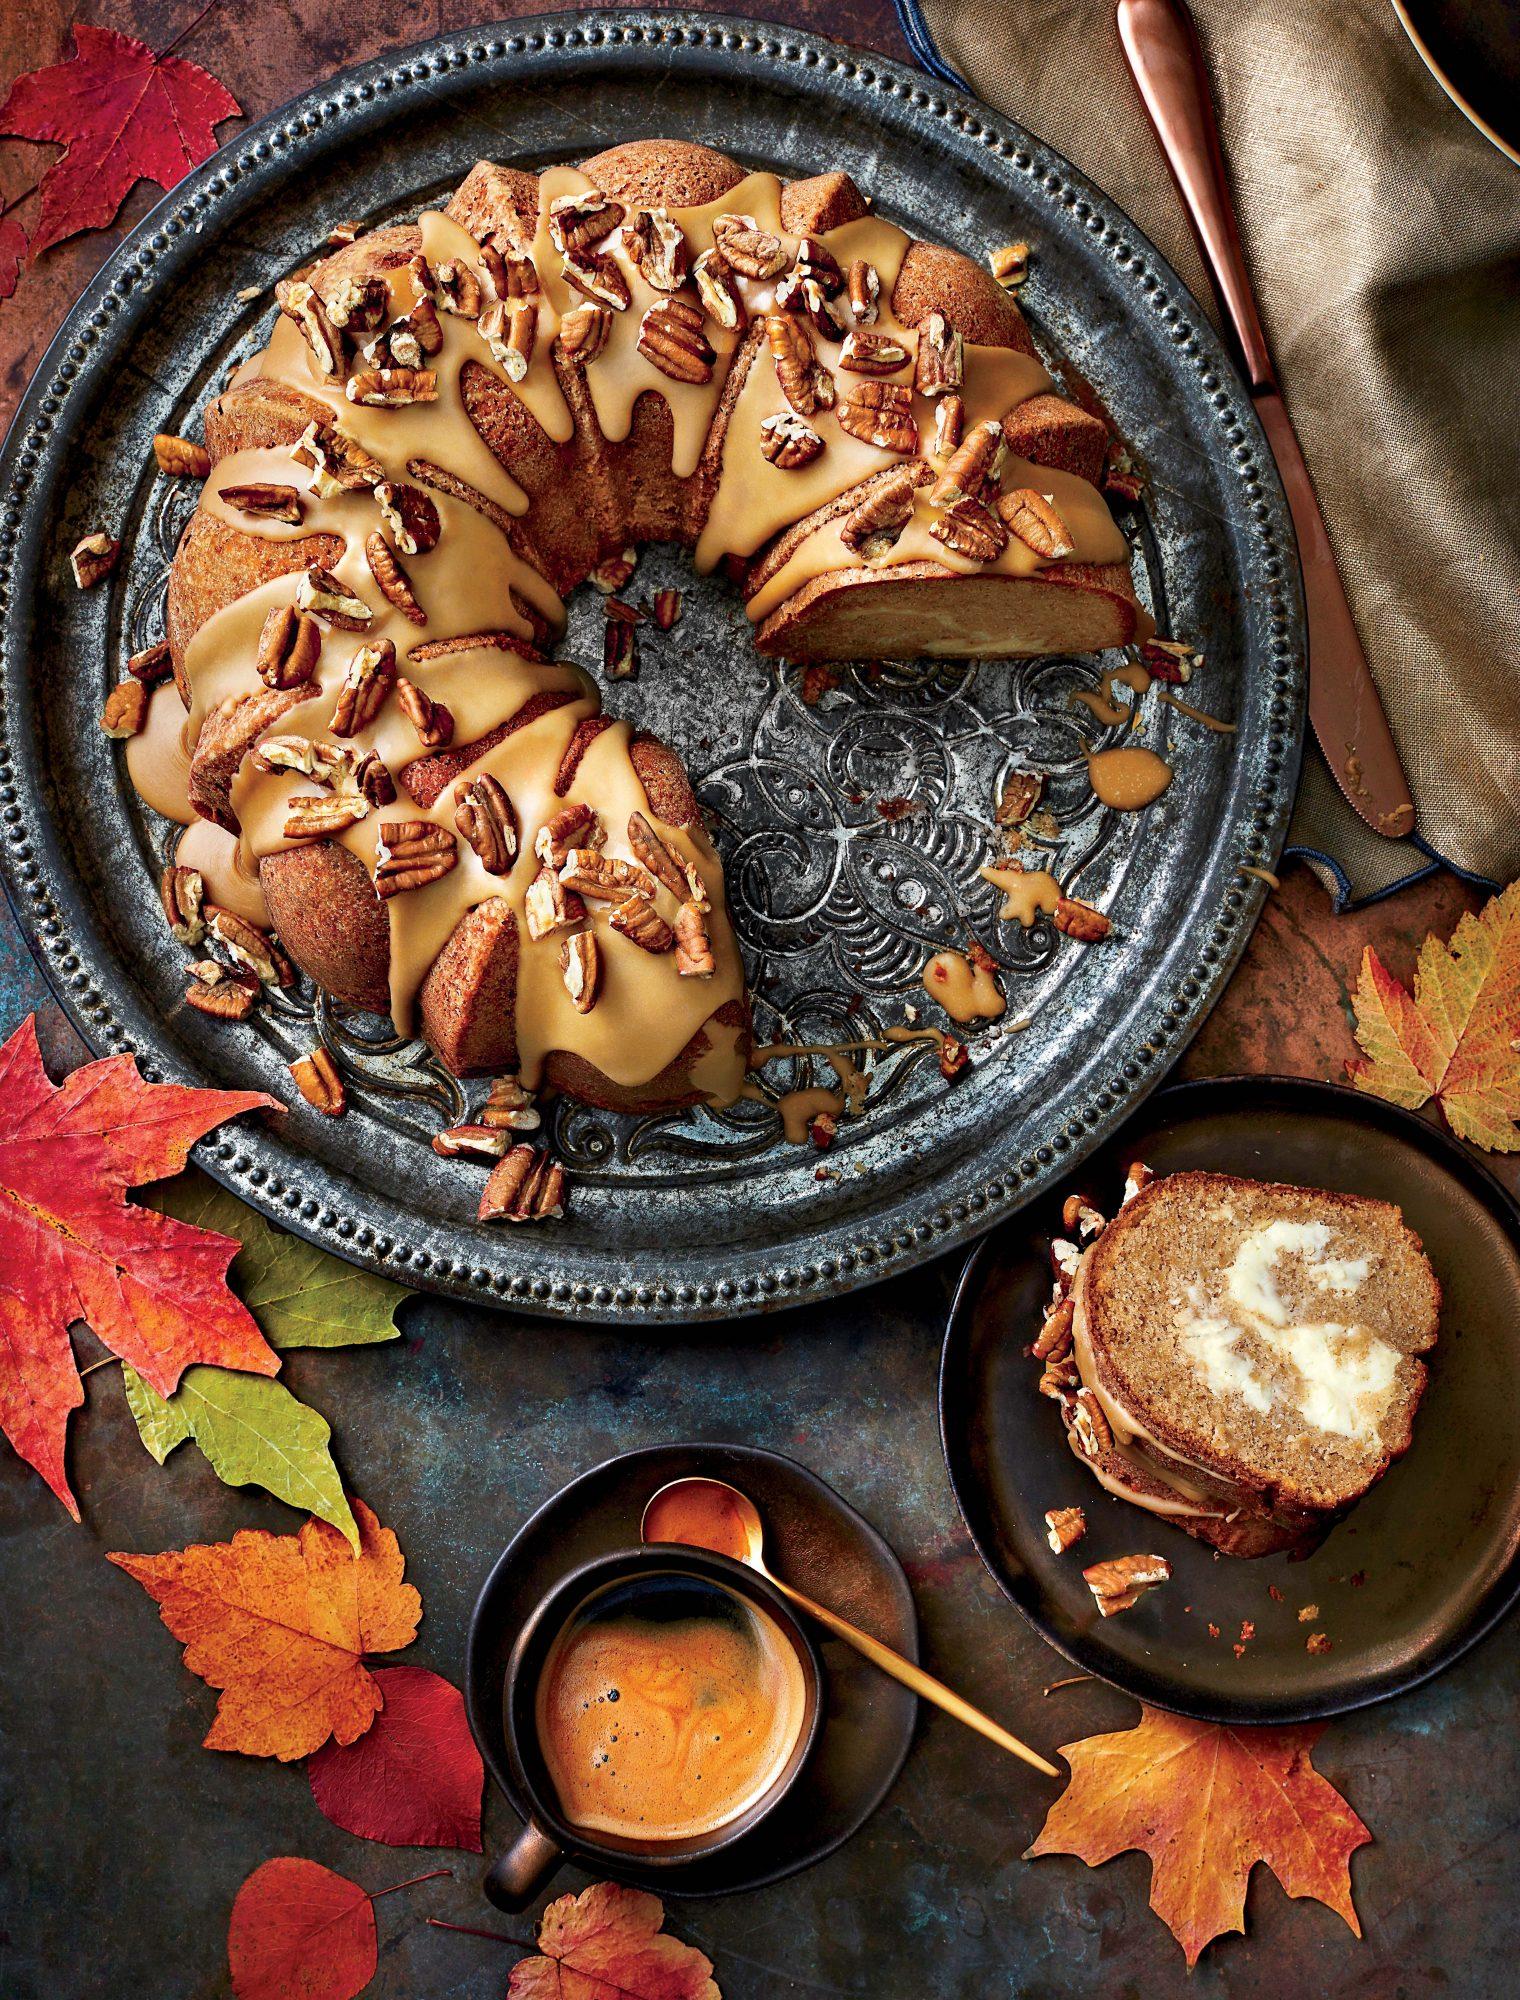 Apple-Spice Bundt Cake with Caramel Frosting